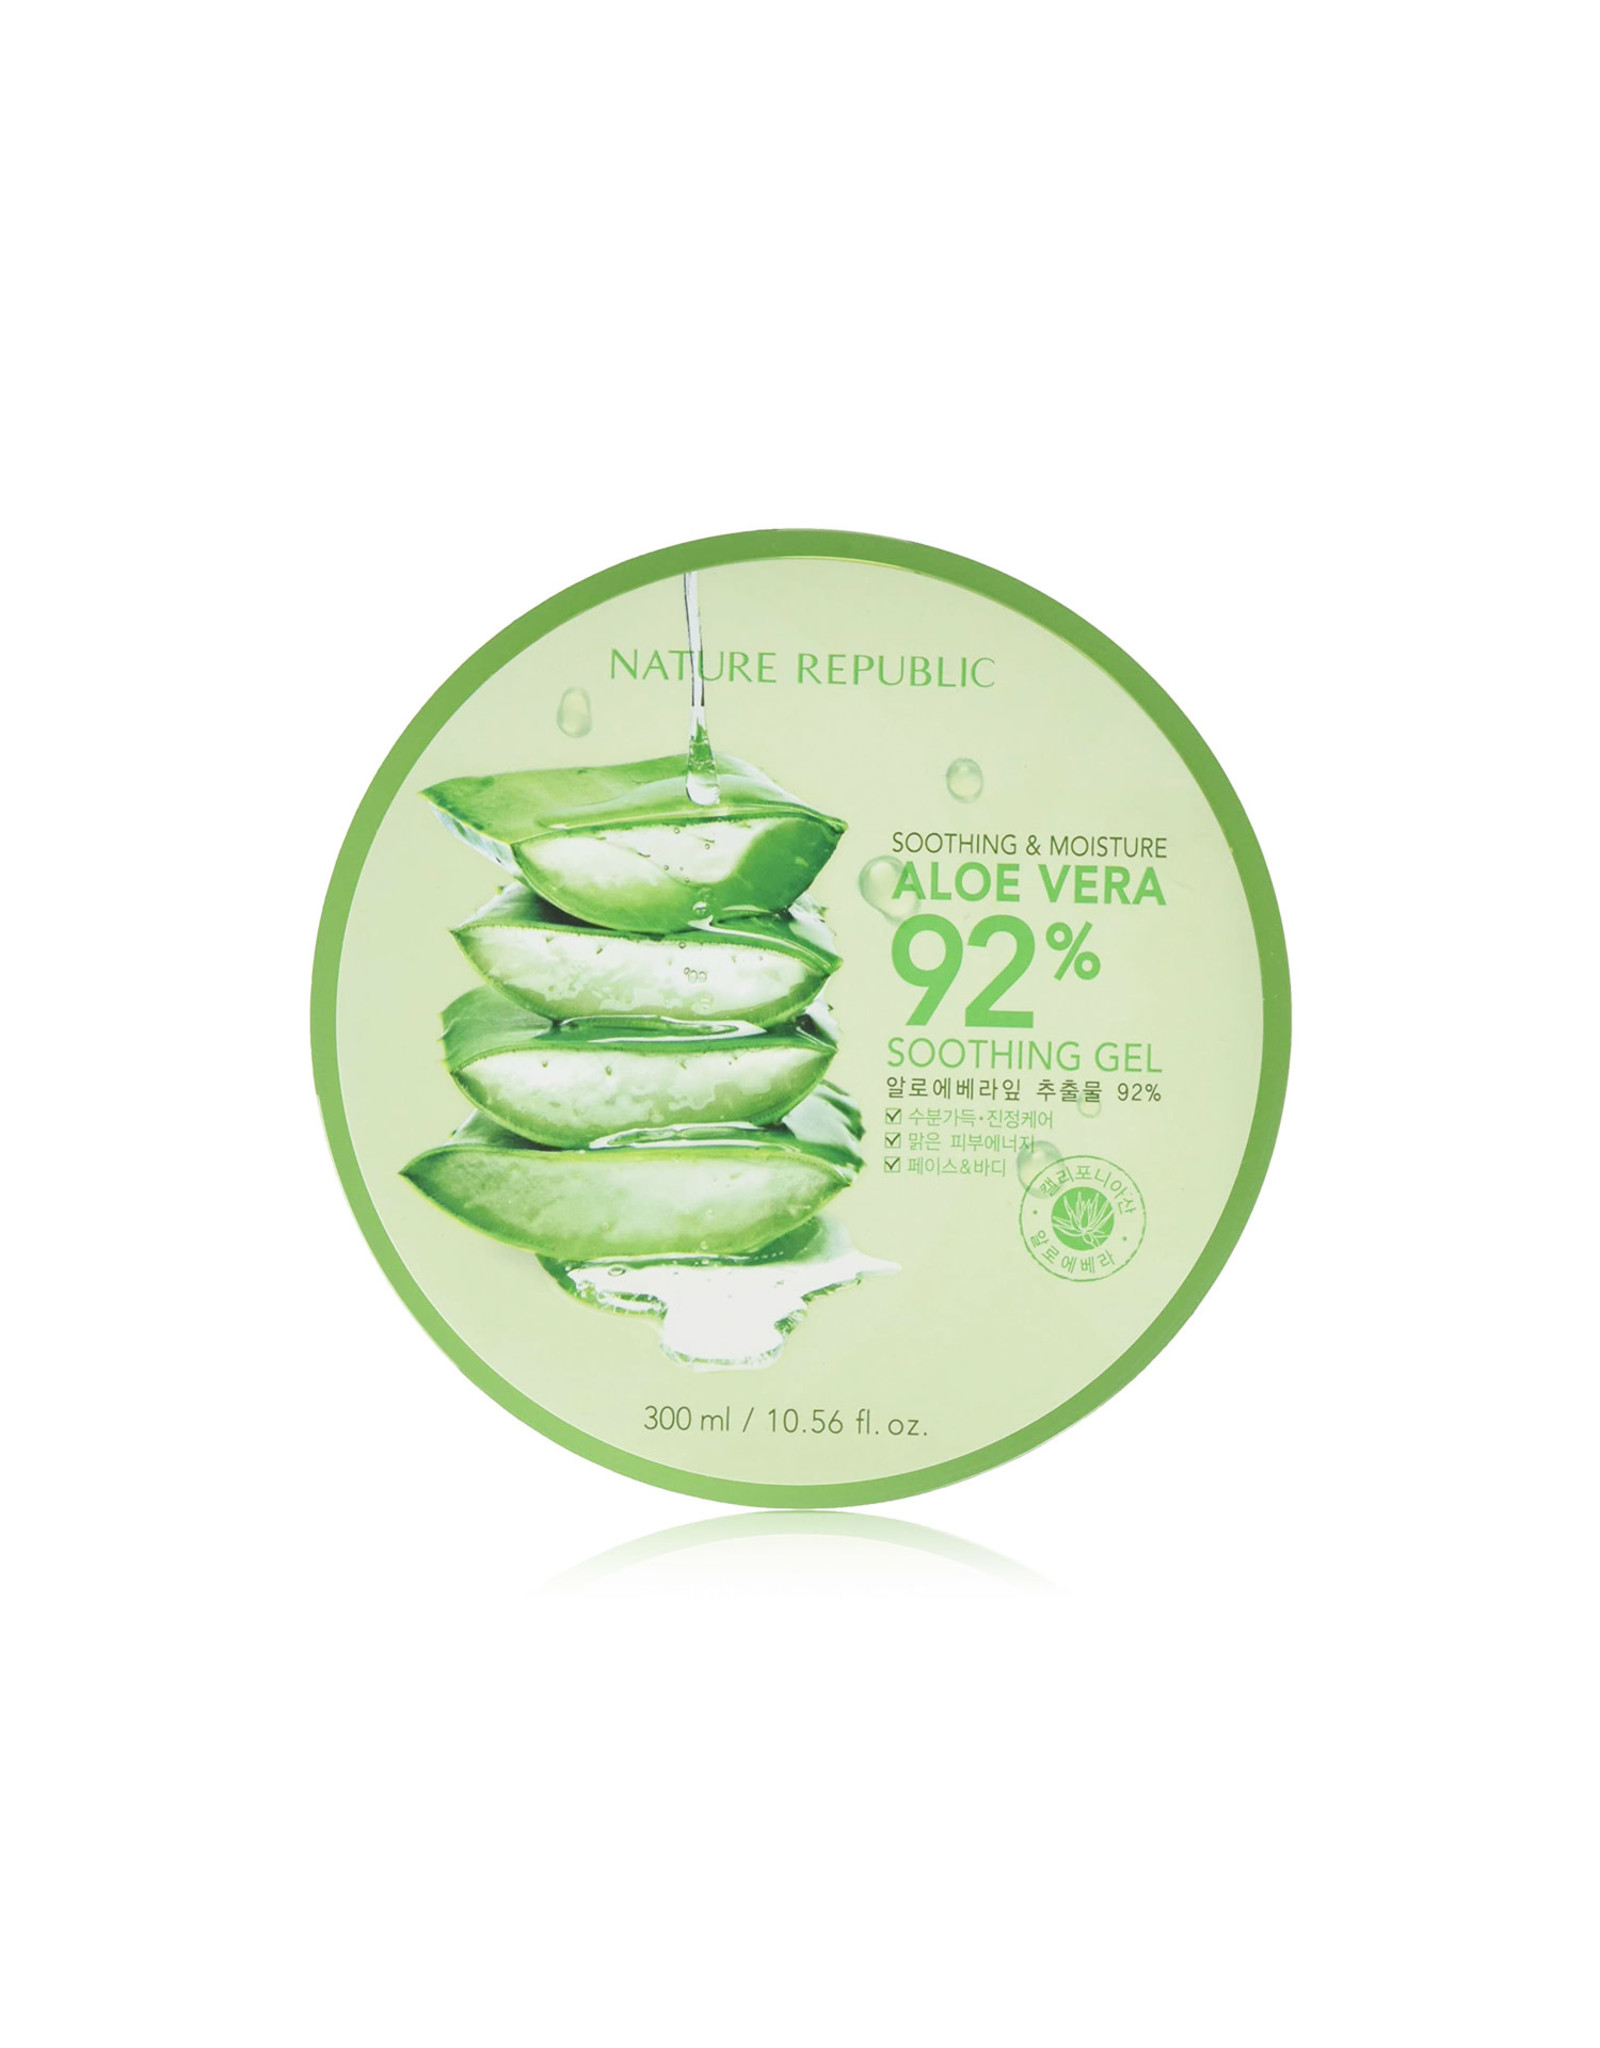 Nature Republic Nature Republic Soothing & Moisture 92% Aloe Vera Gel 300ml